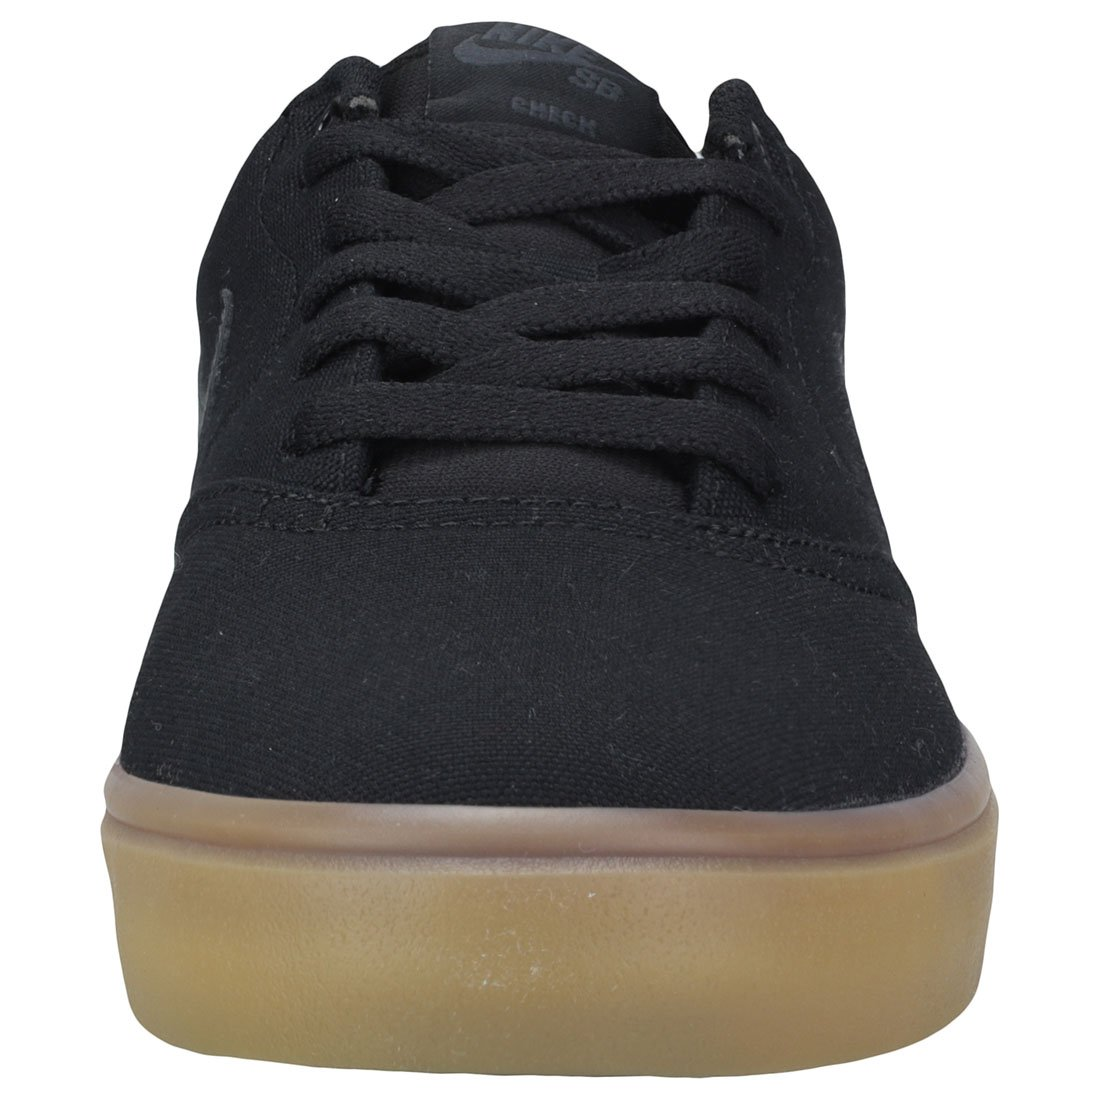 Nike Men's SB Check Solarsoft Canvas Skateboarding Shoes Black/Black-Gum Light Brown 10 by Nike (Image #3)